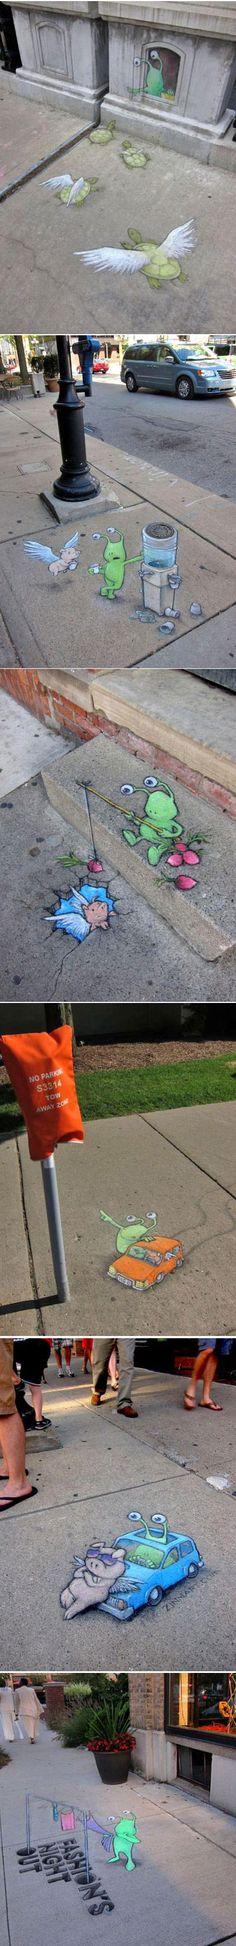 Sluggo Chalk Street Art by David Zinn